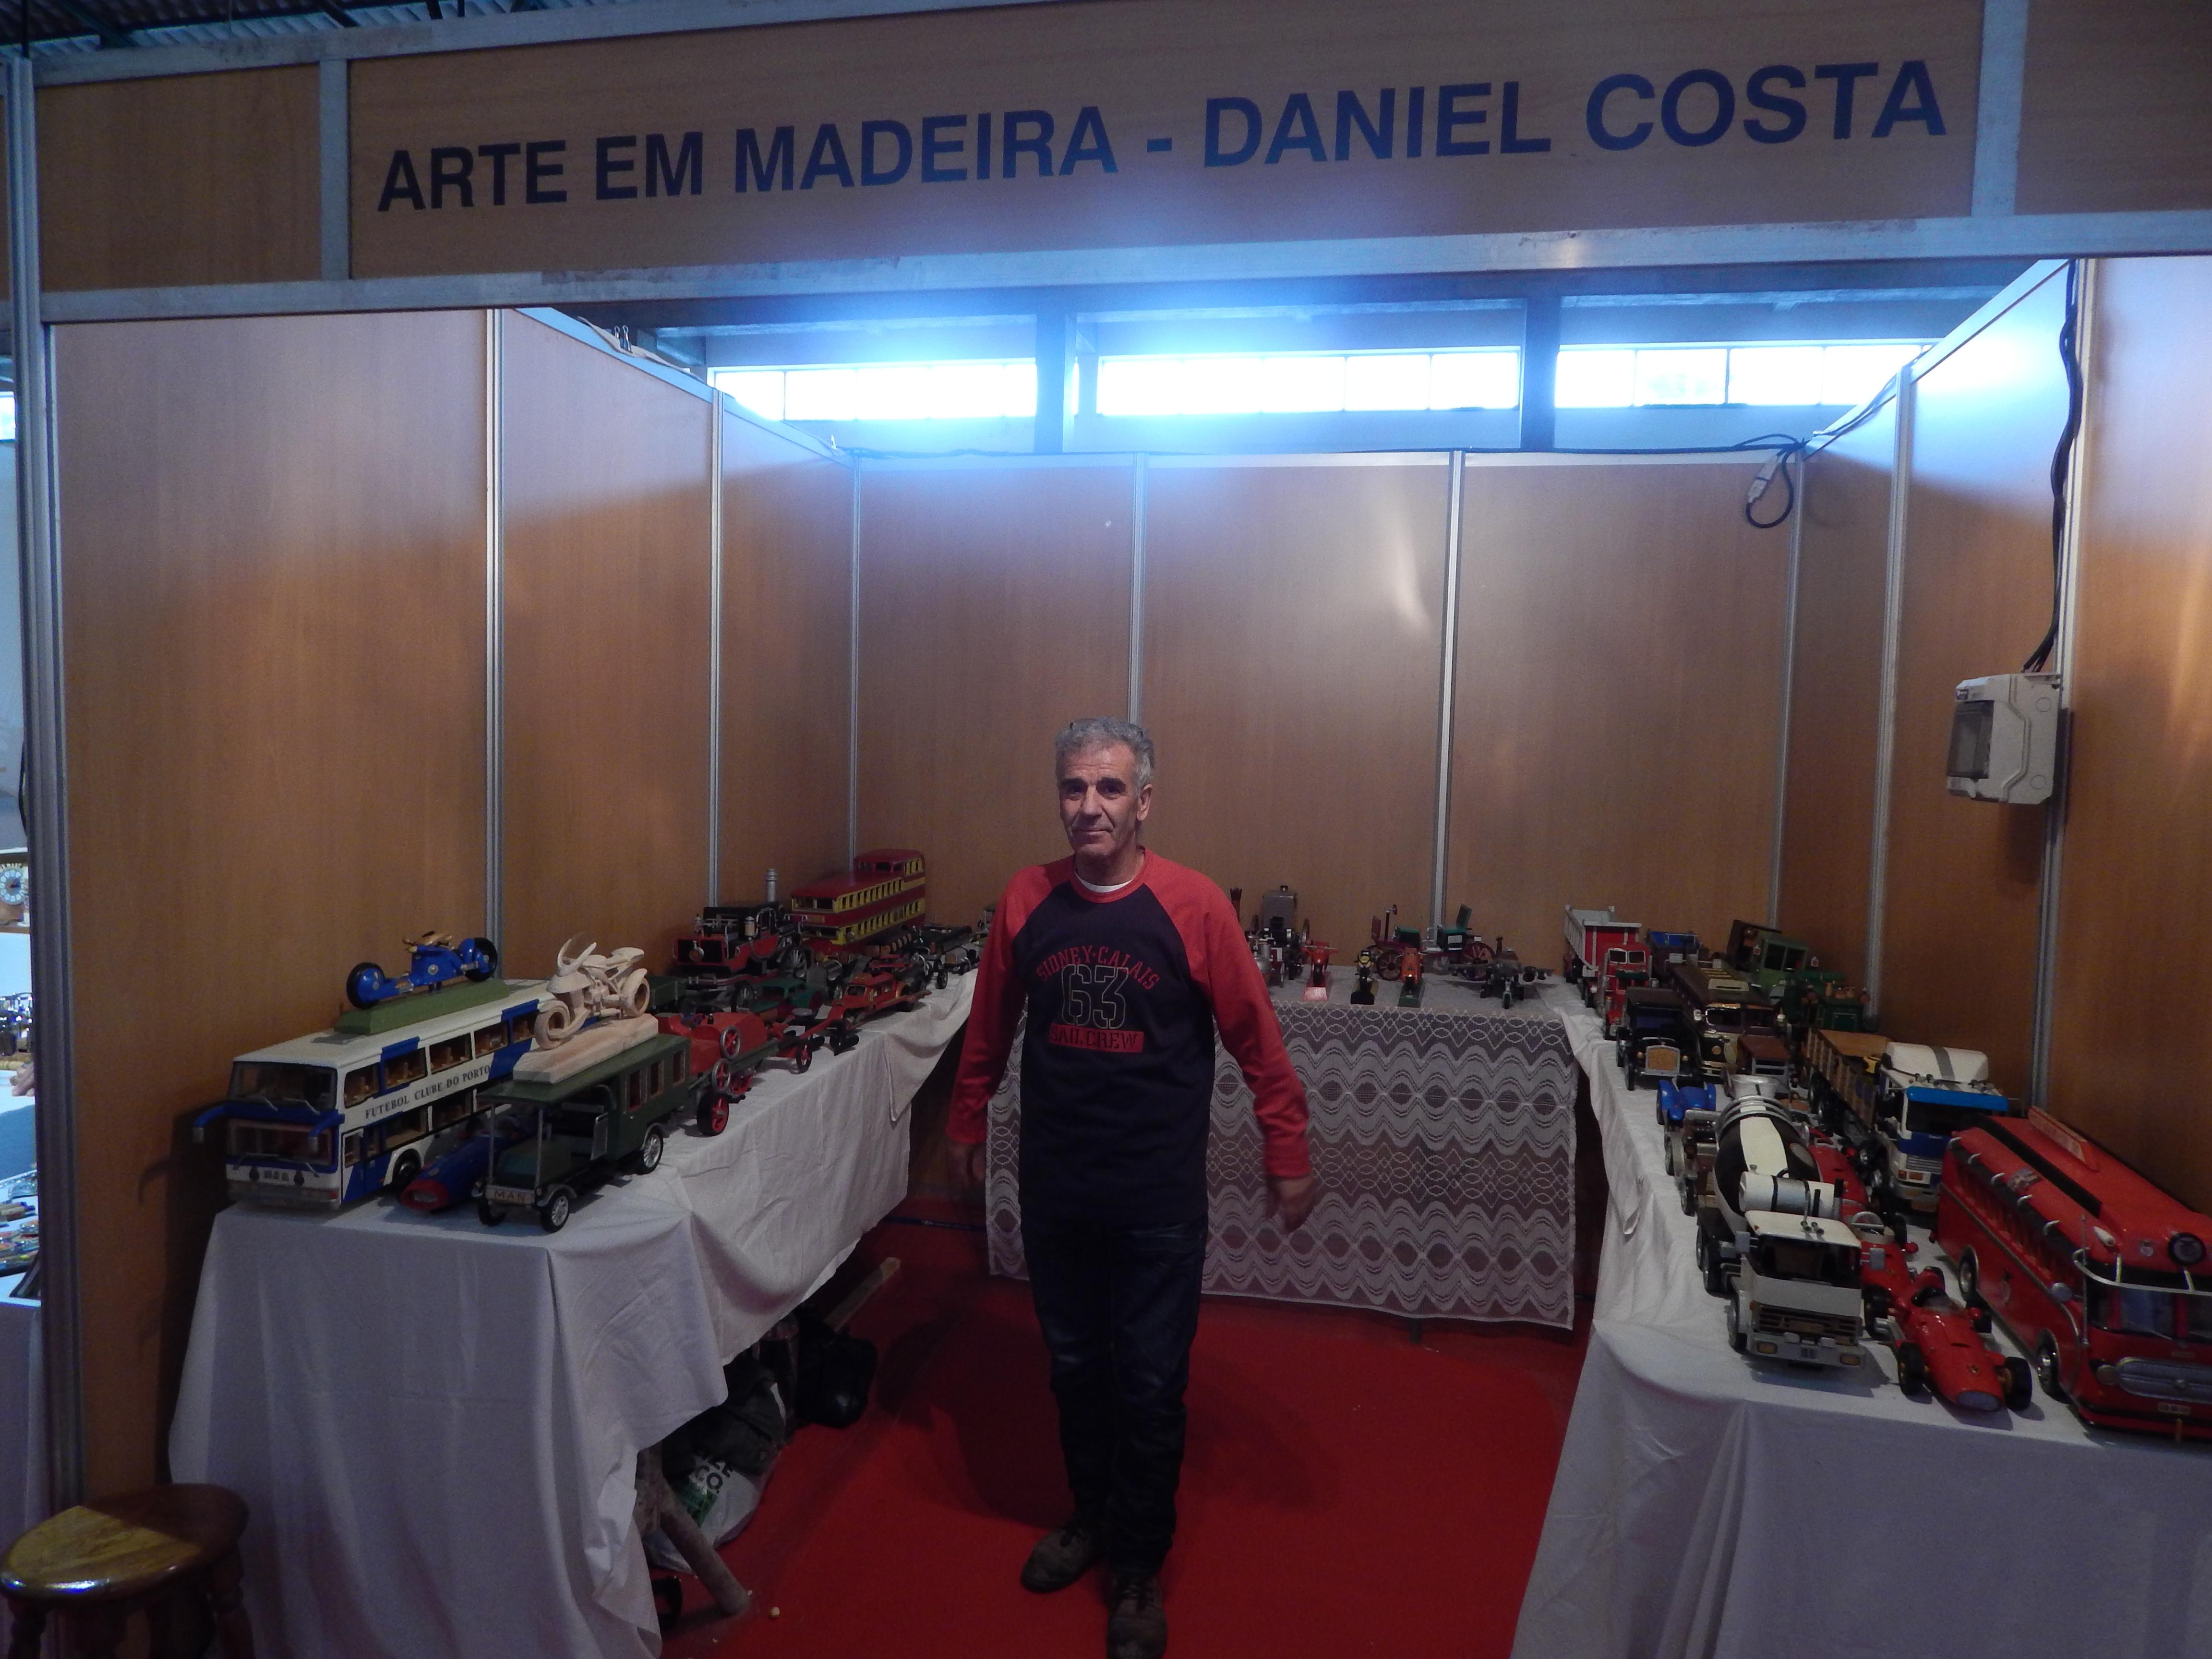 Arte en Madera (Daniel Costa)